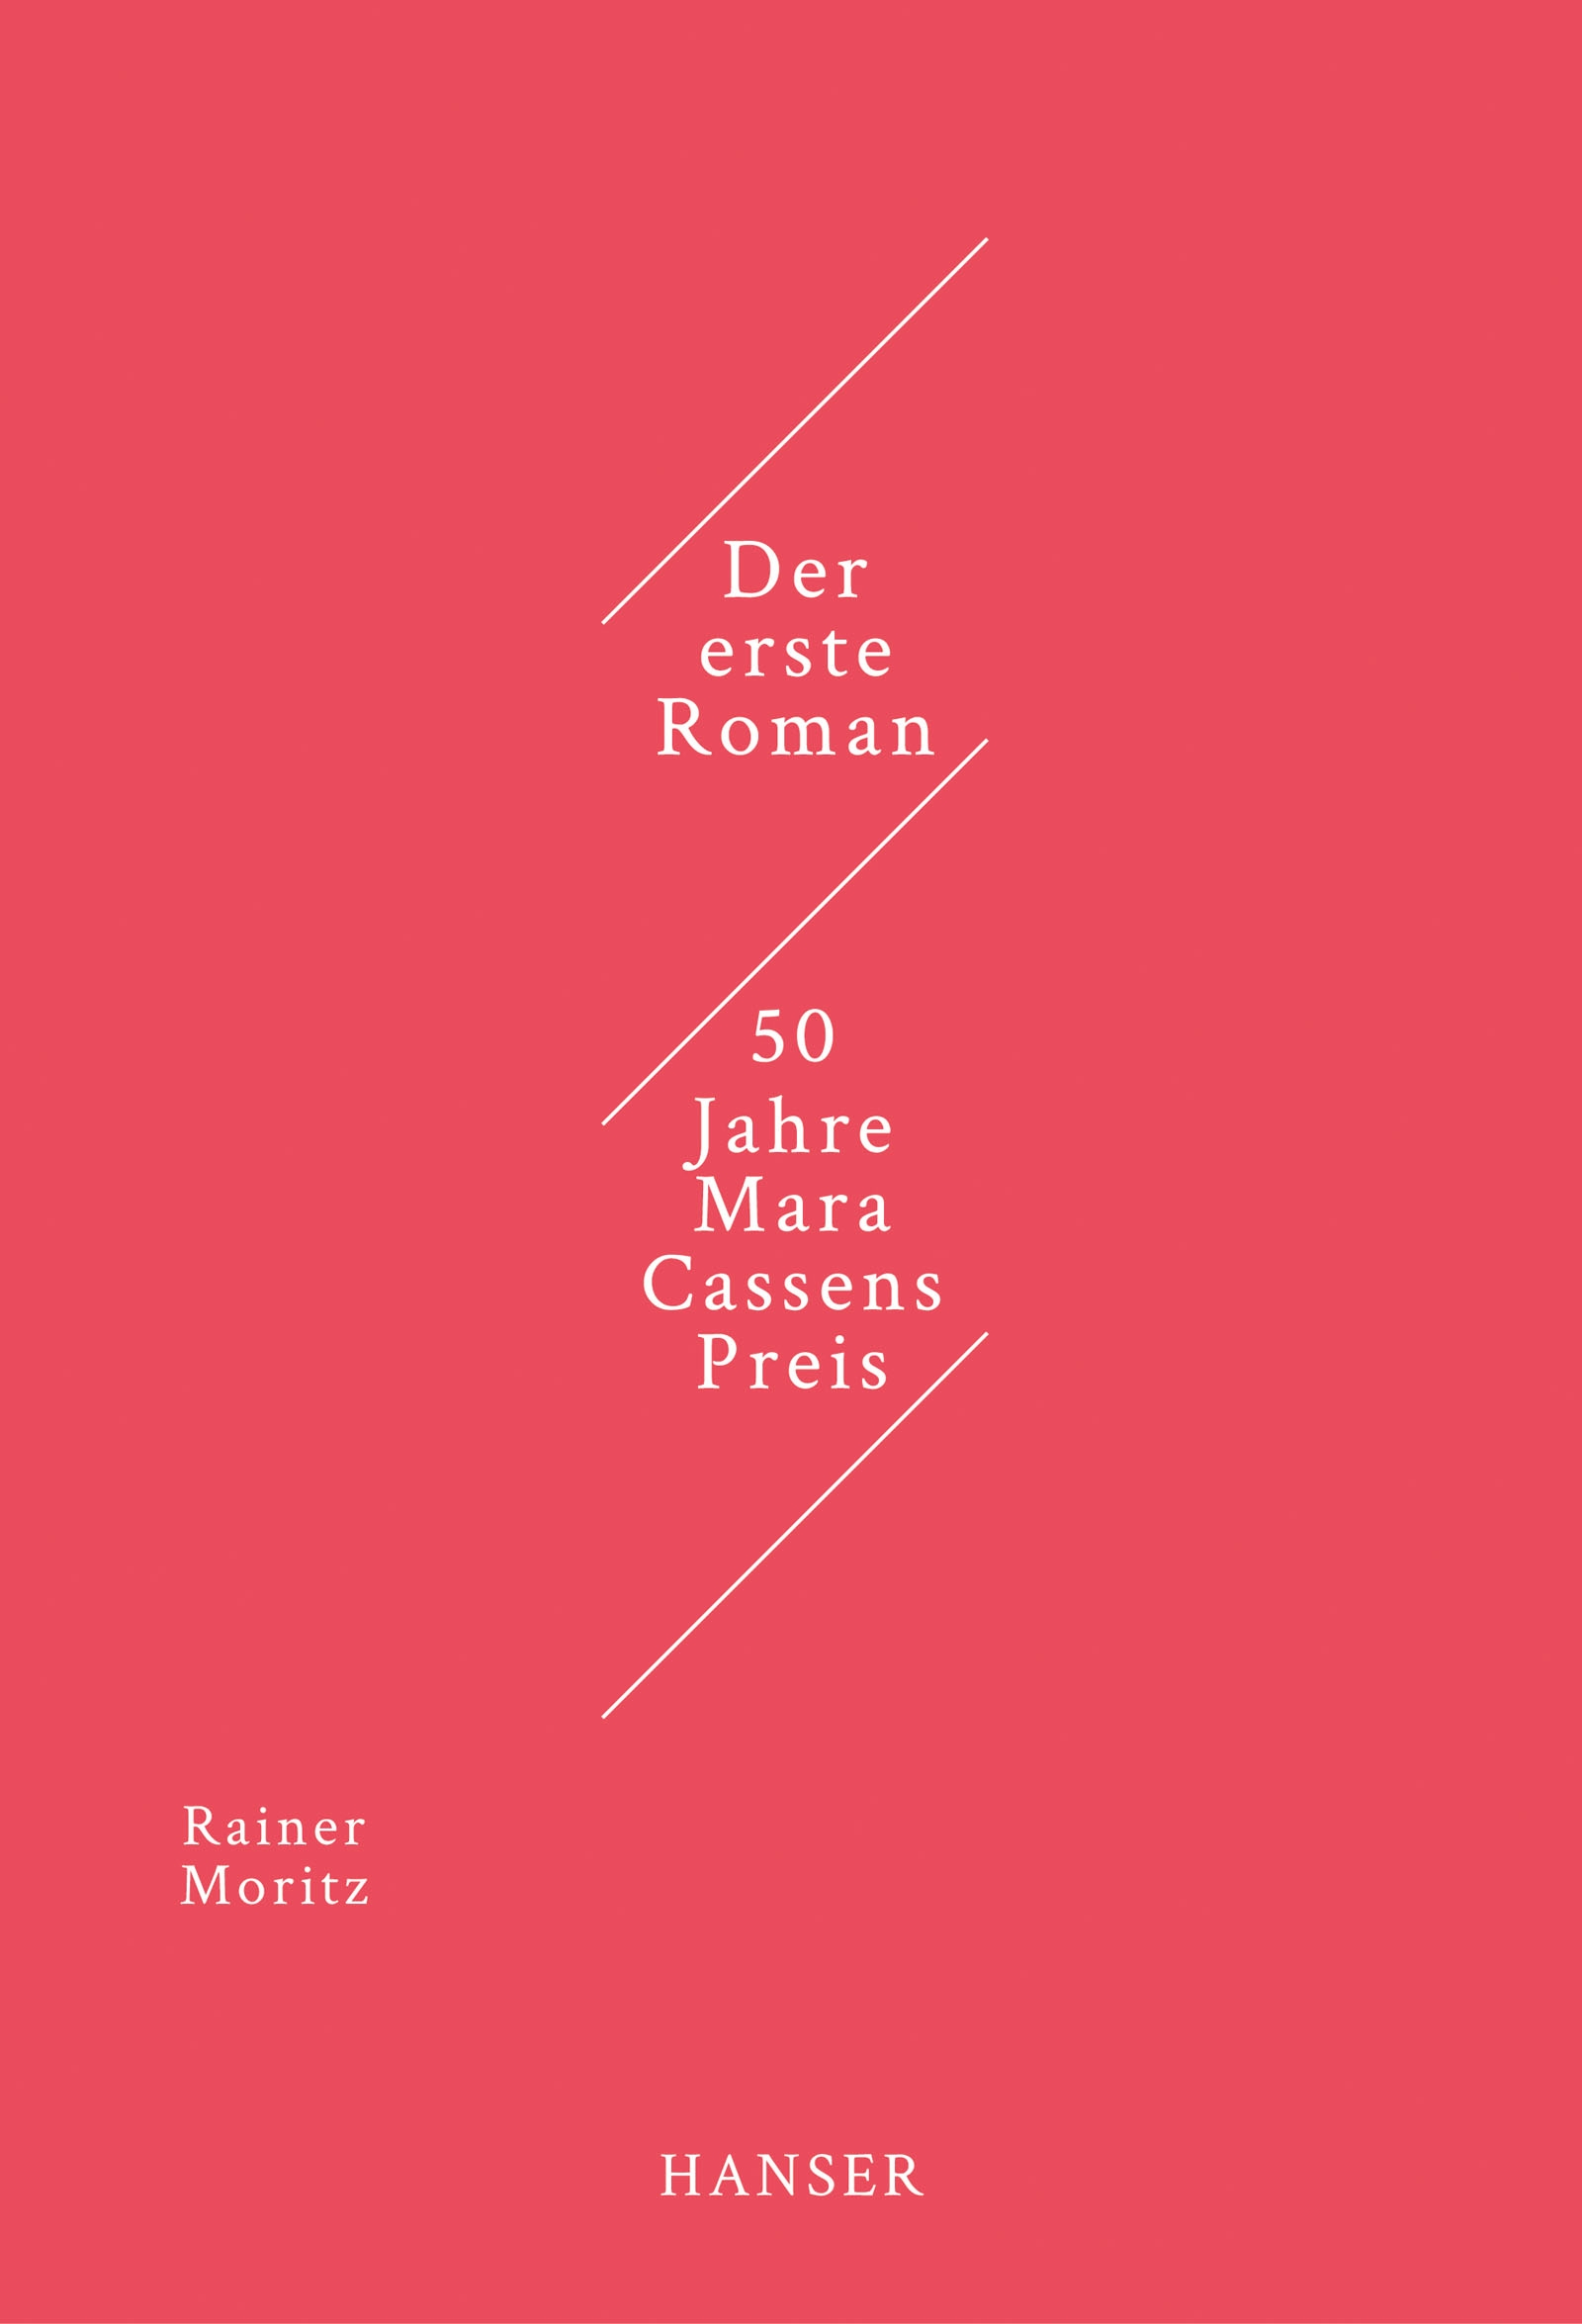 50 Jahre Mara Cassens Preis